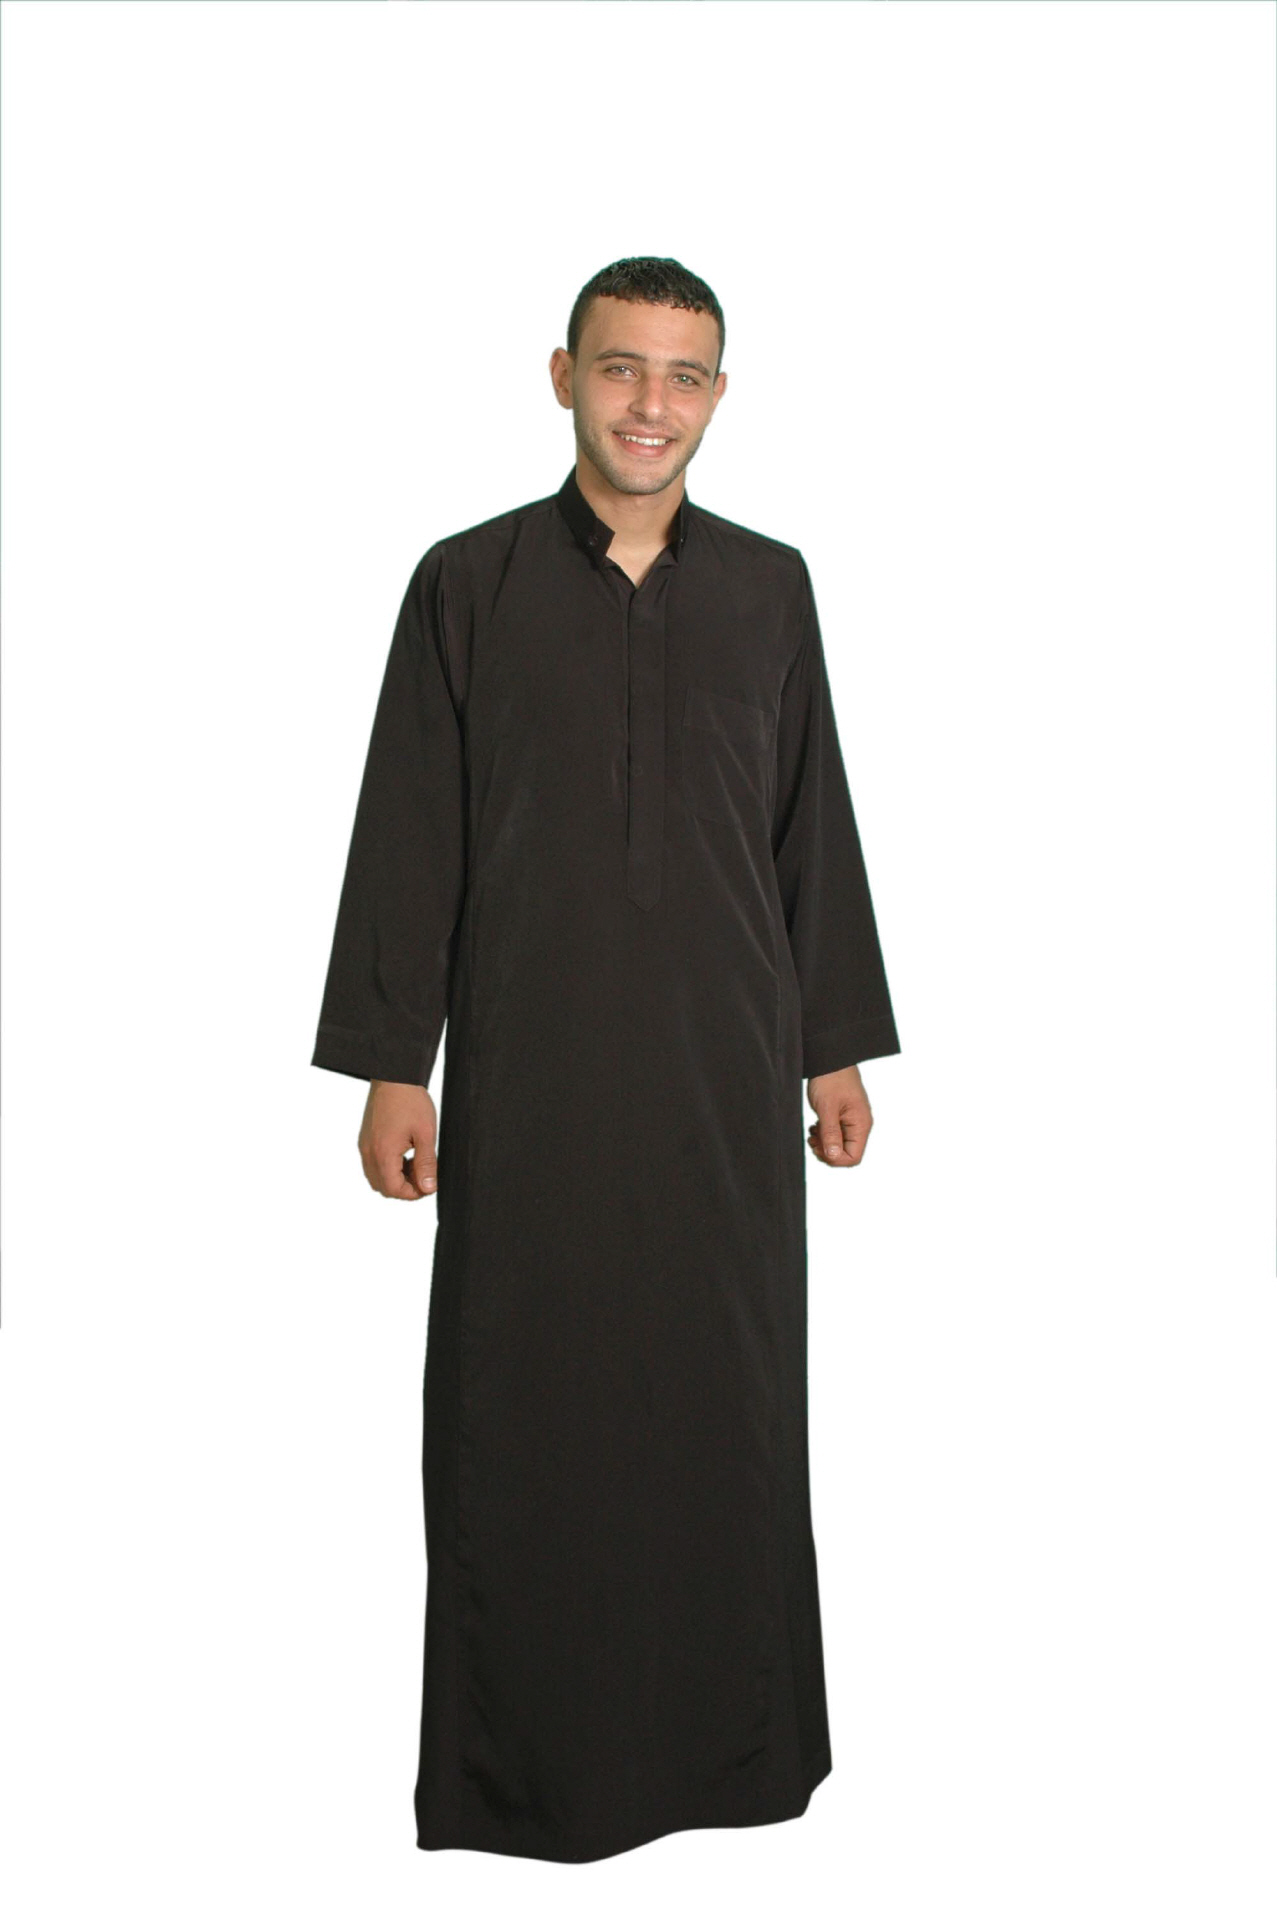 Herren-Kaftan im Saudi Style in schwarz- Arabische Herren Kleider